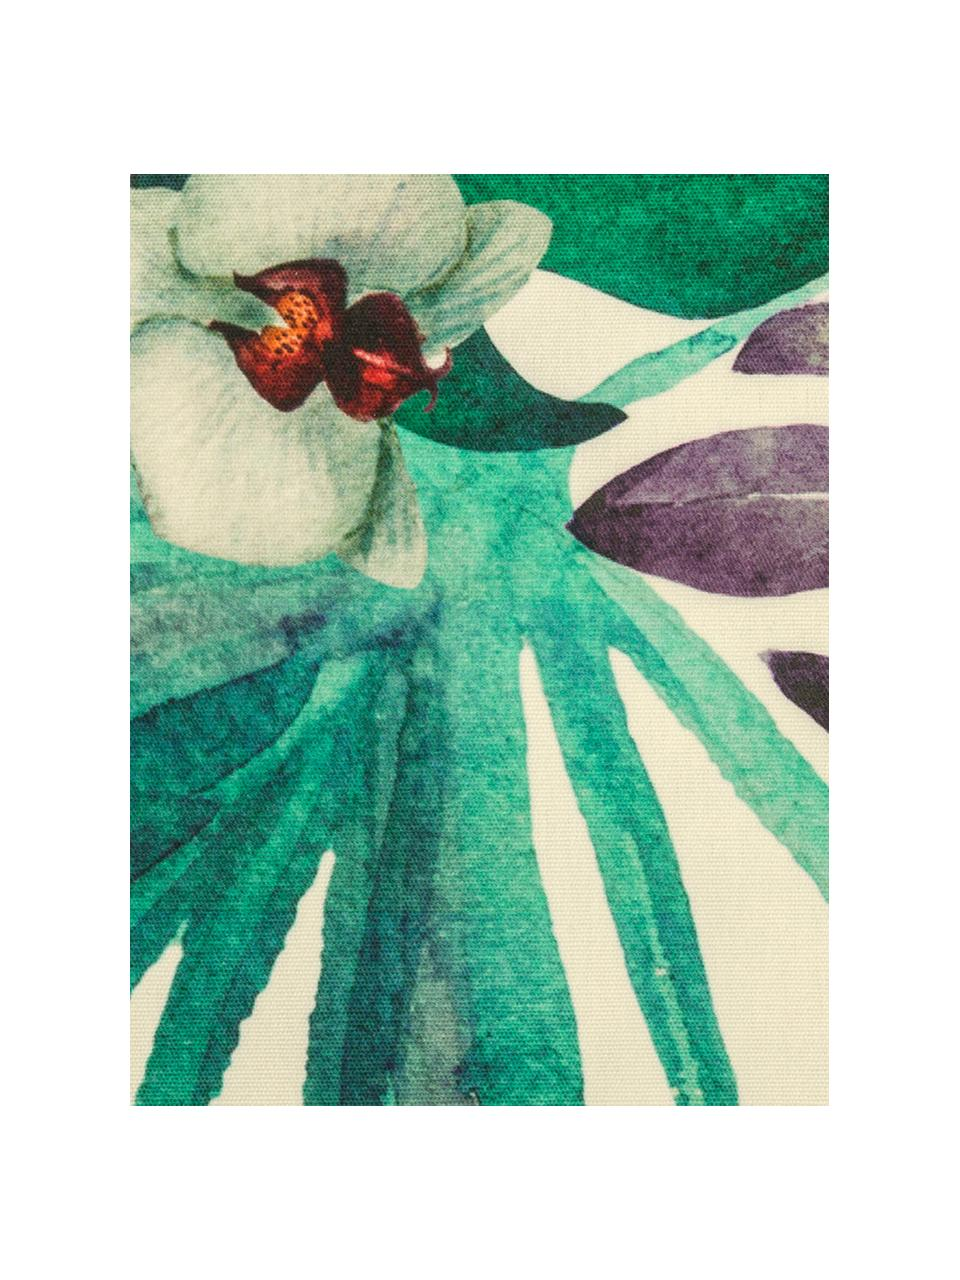 Outdoor-Kissenhülle Laos mit tropischem Print, 100% Dralon (Polyacryl), Beige, Mehrfarbig, 40 x 60 cm